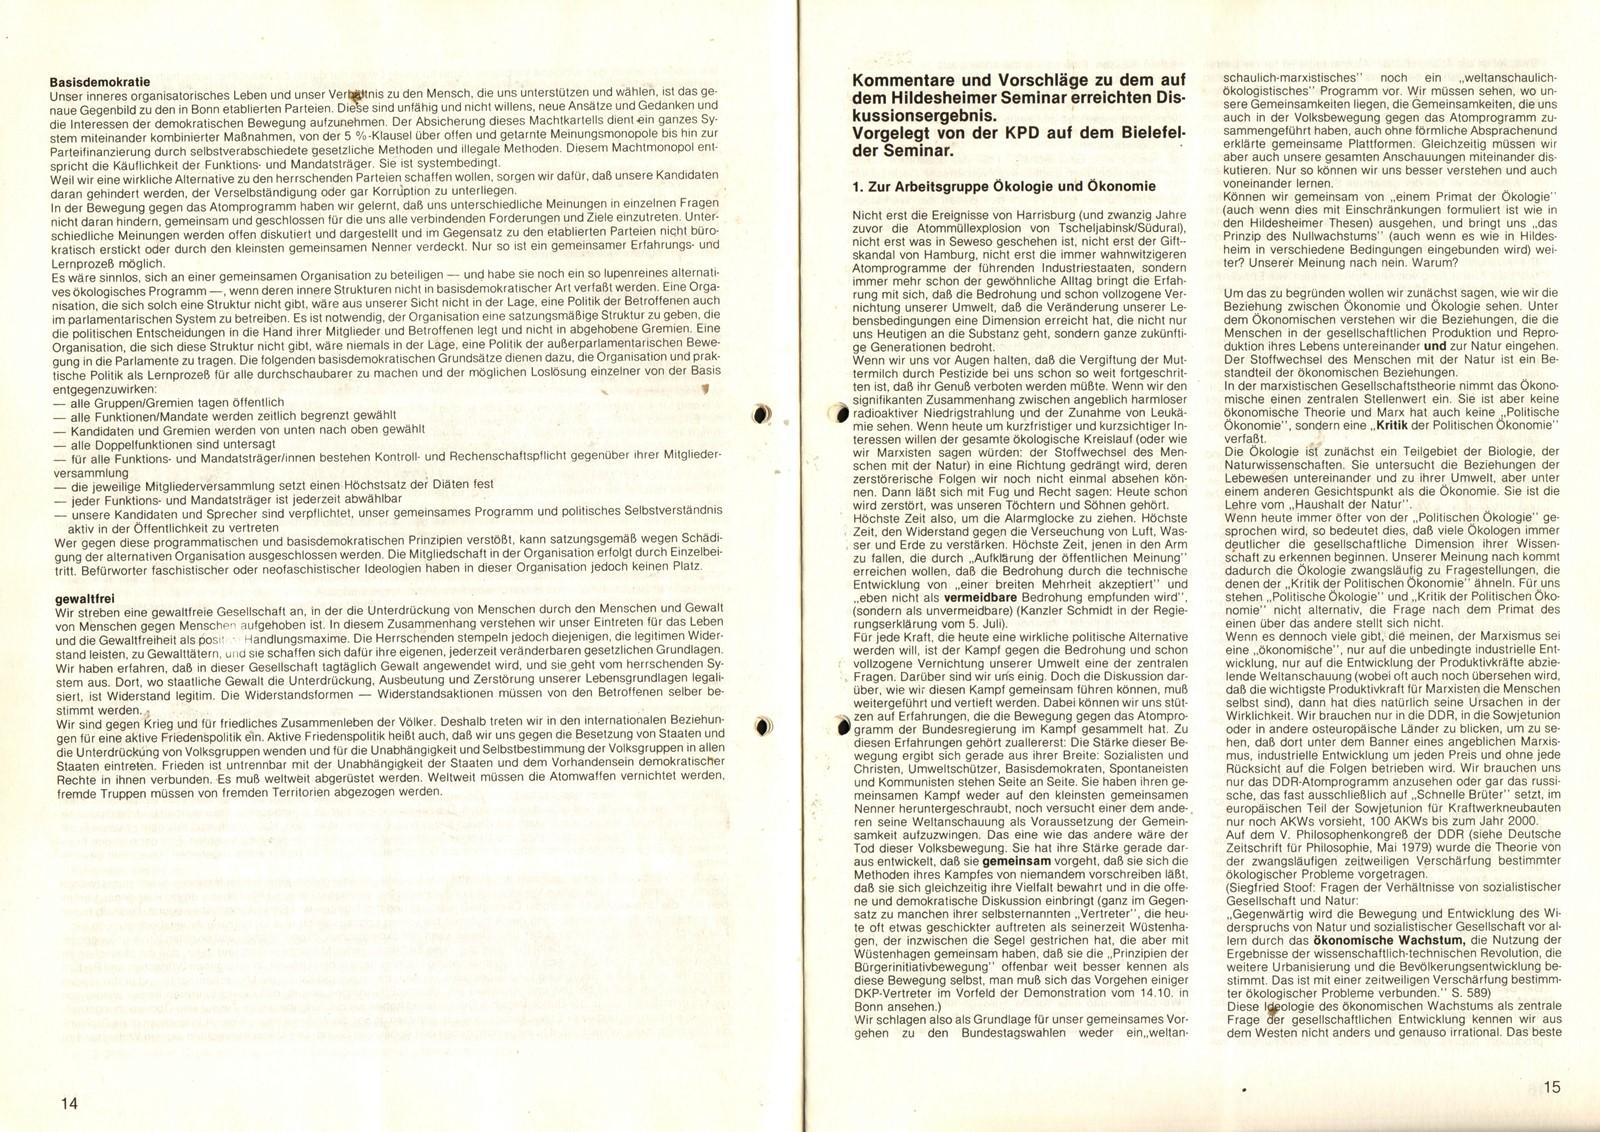 KPDAO_1979_Diskussion_Bundestagswahlen_1980_08